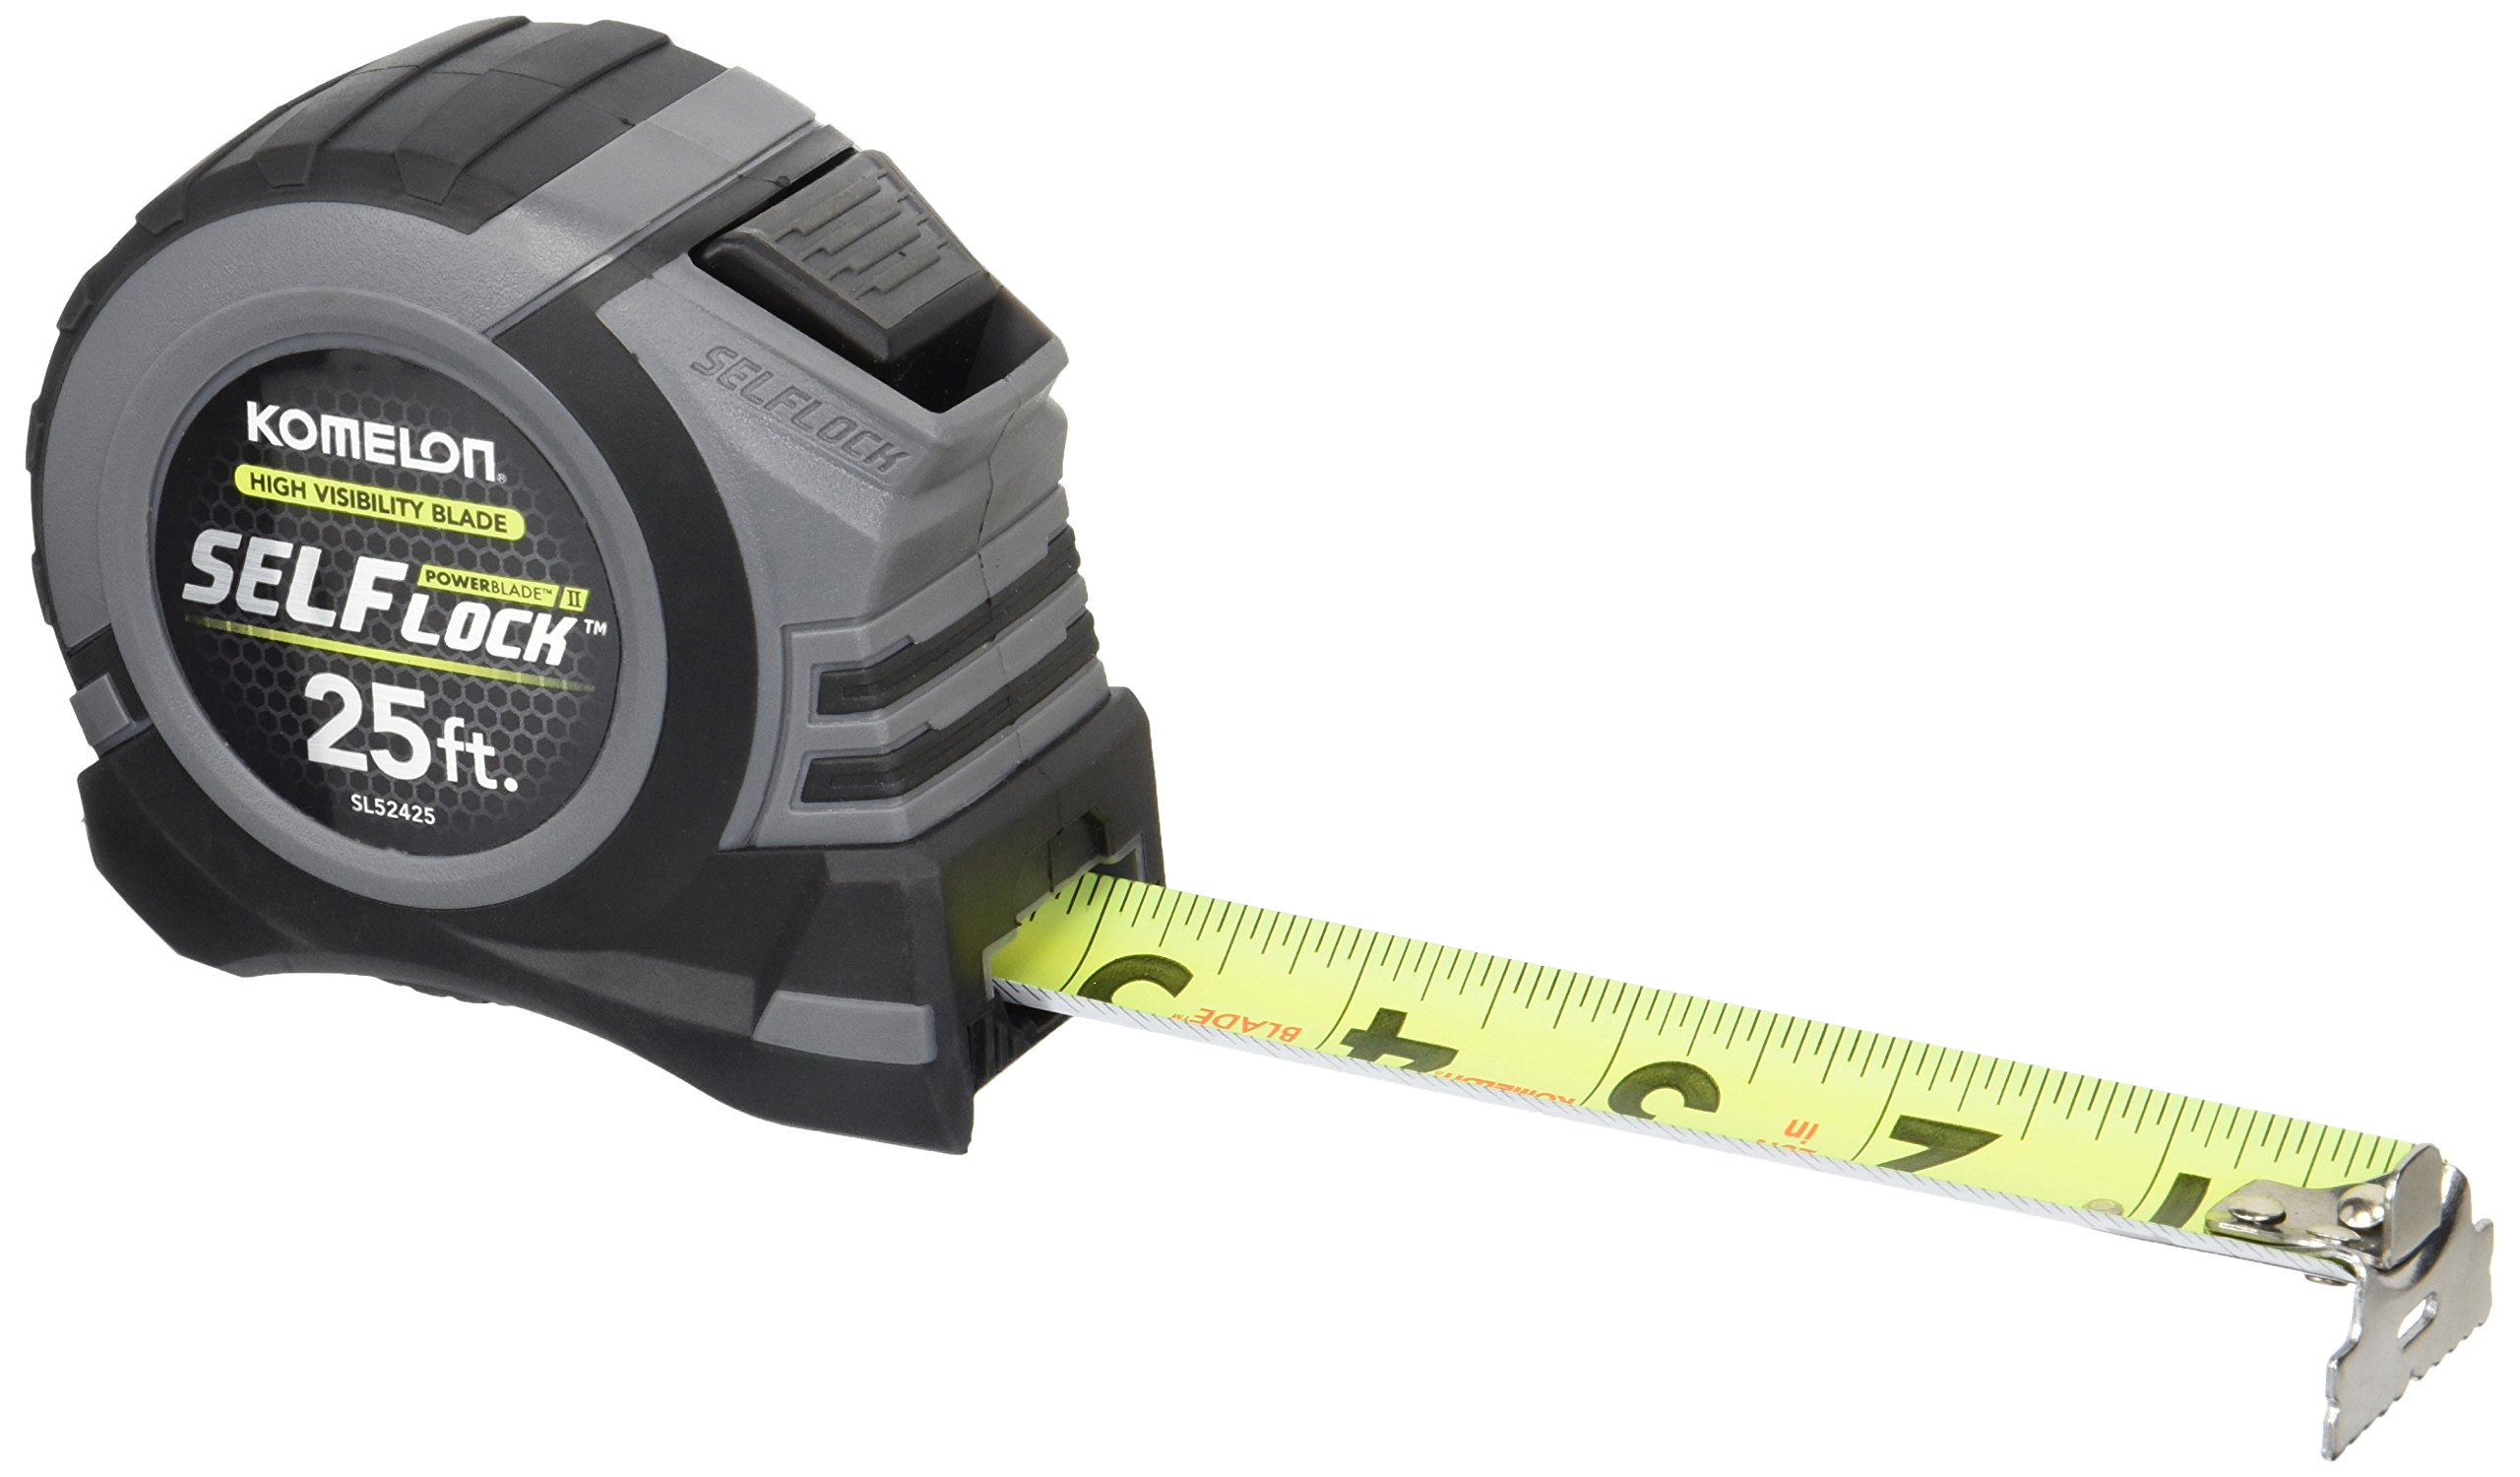 Komelon SL52425 Self Lock Power Blade II, 25', Black/Grey